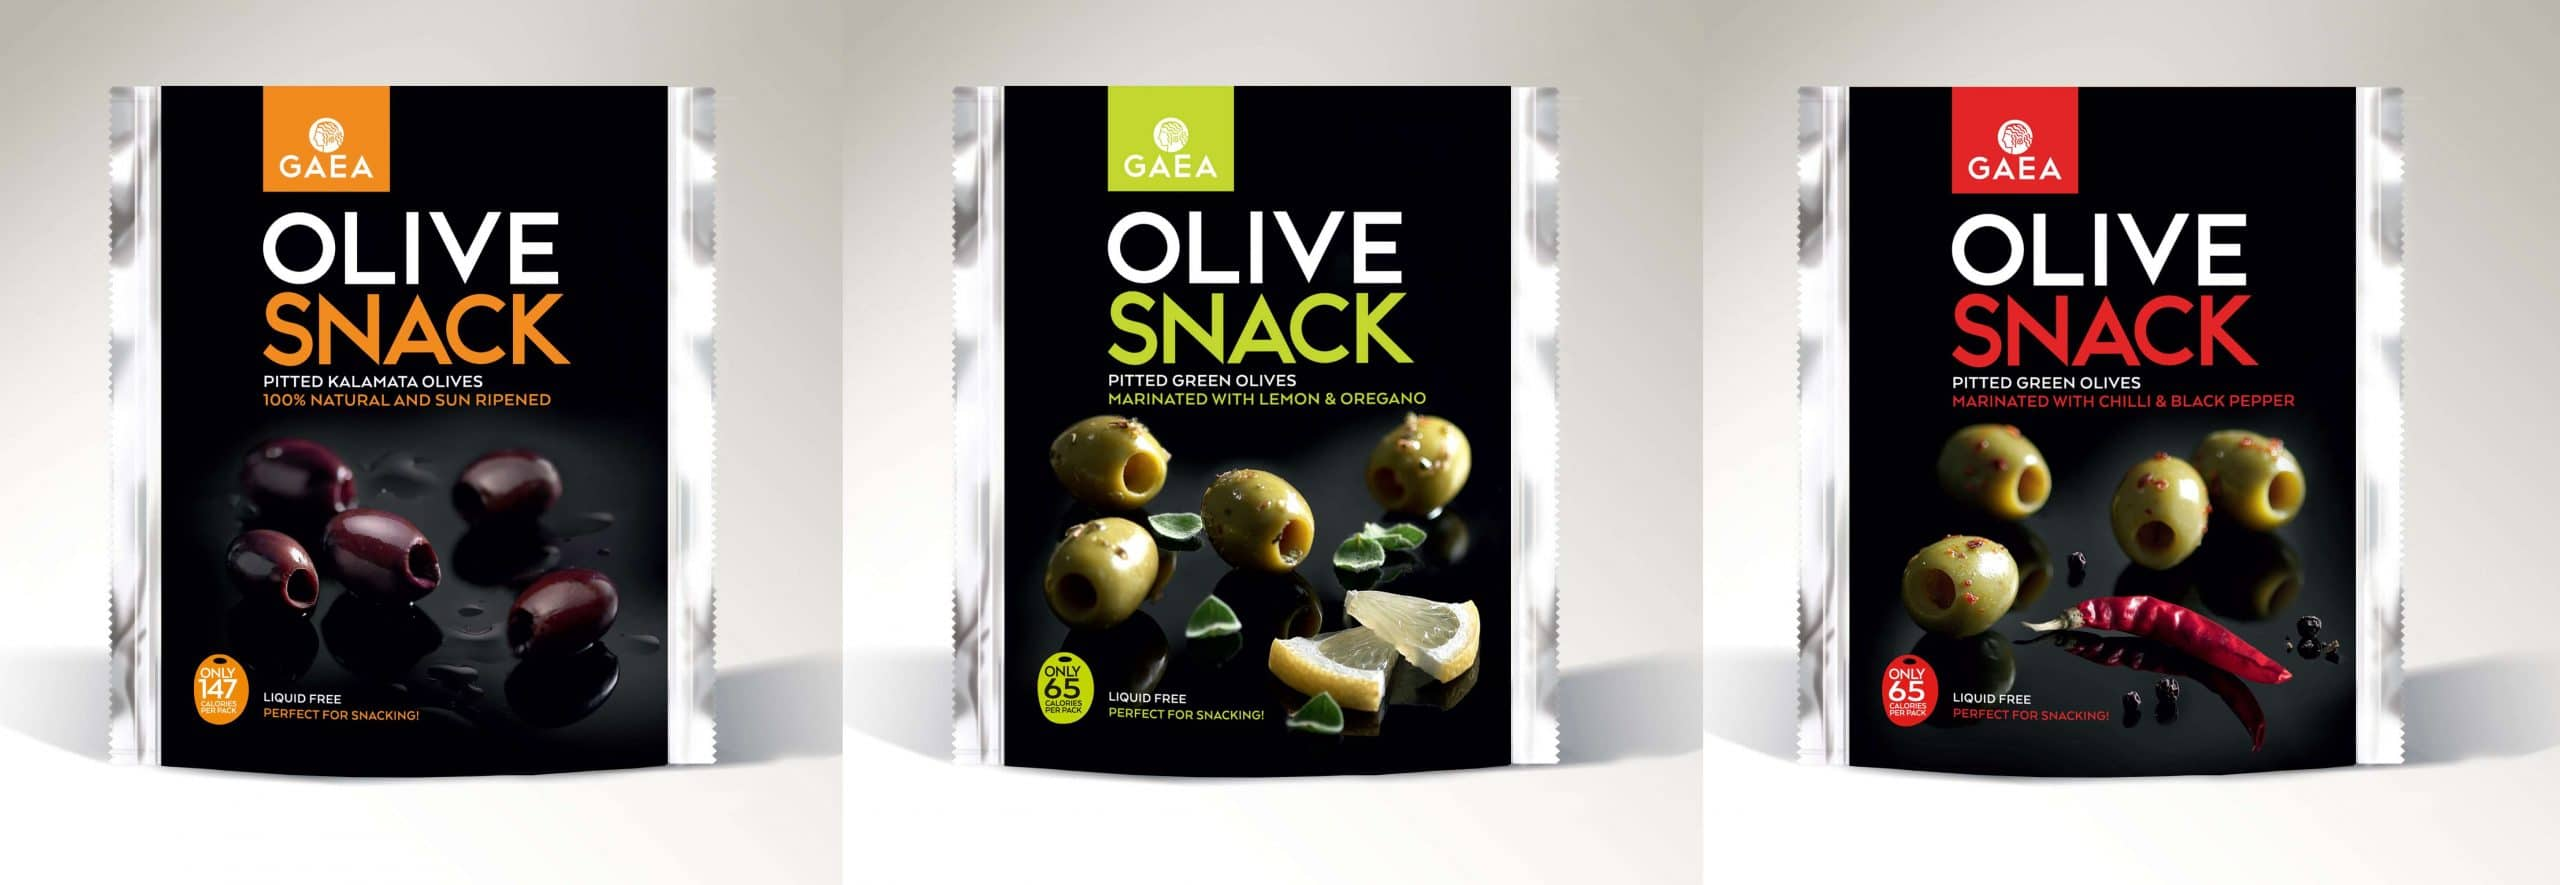 gaea-olive-snack-65gx3_3d-300dpi-hi-res